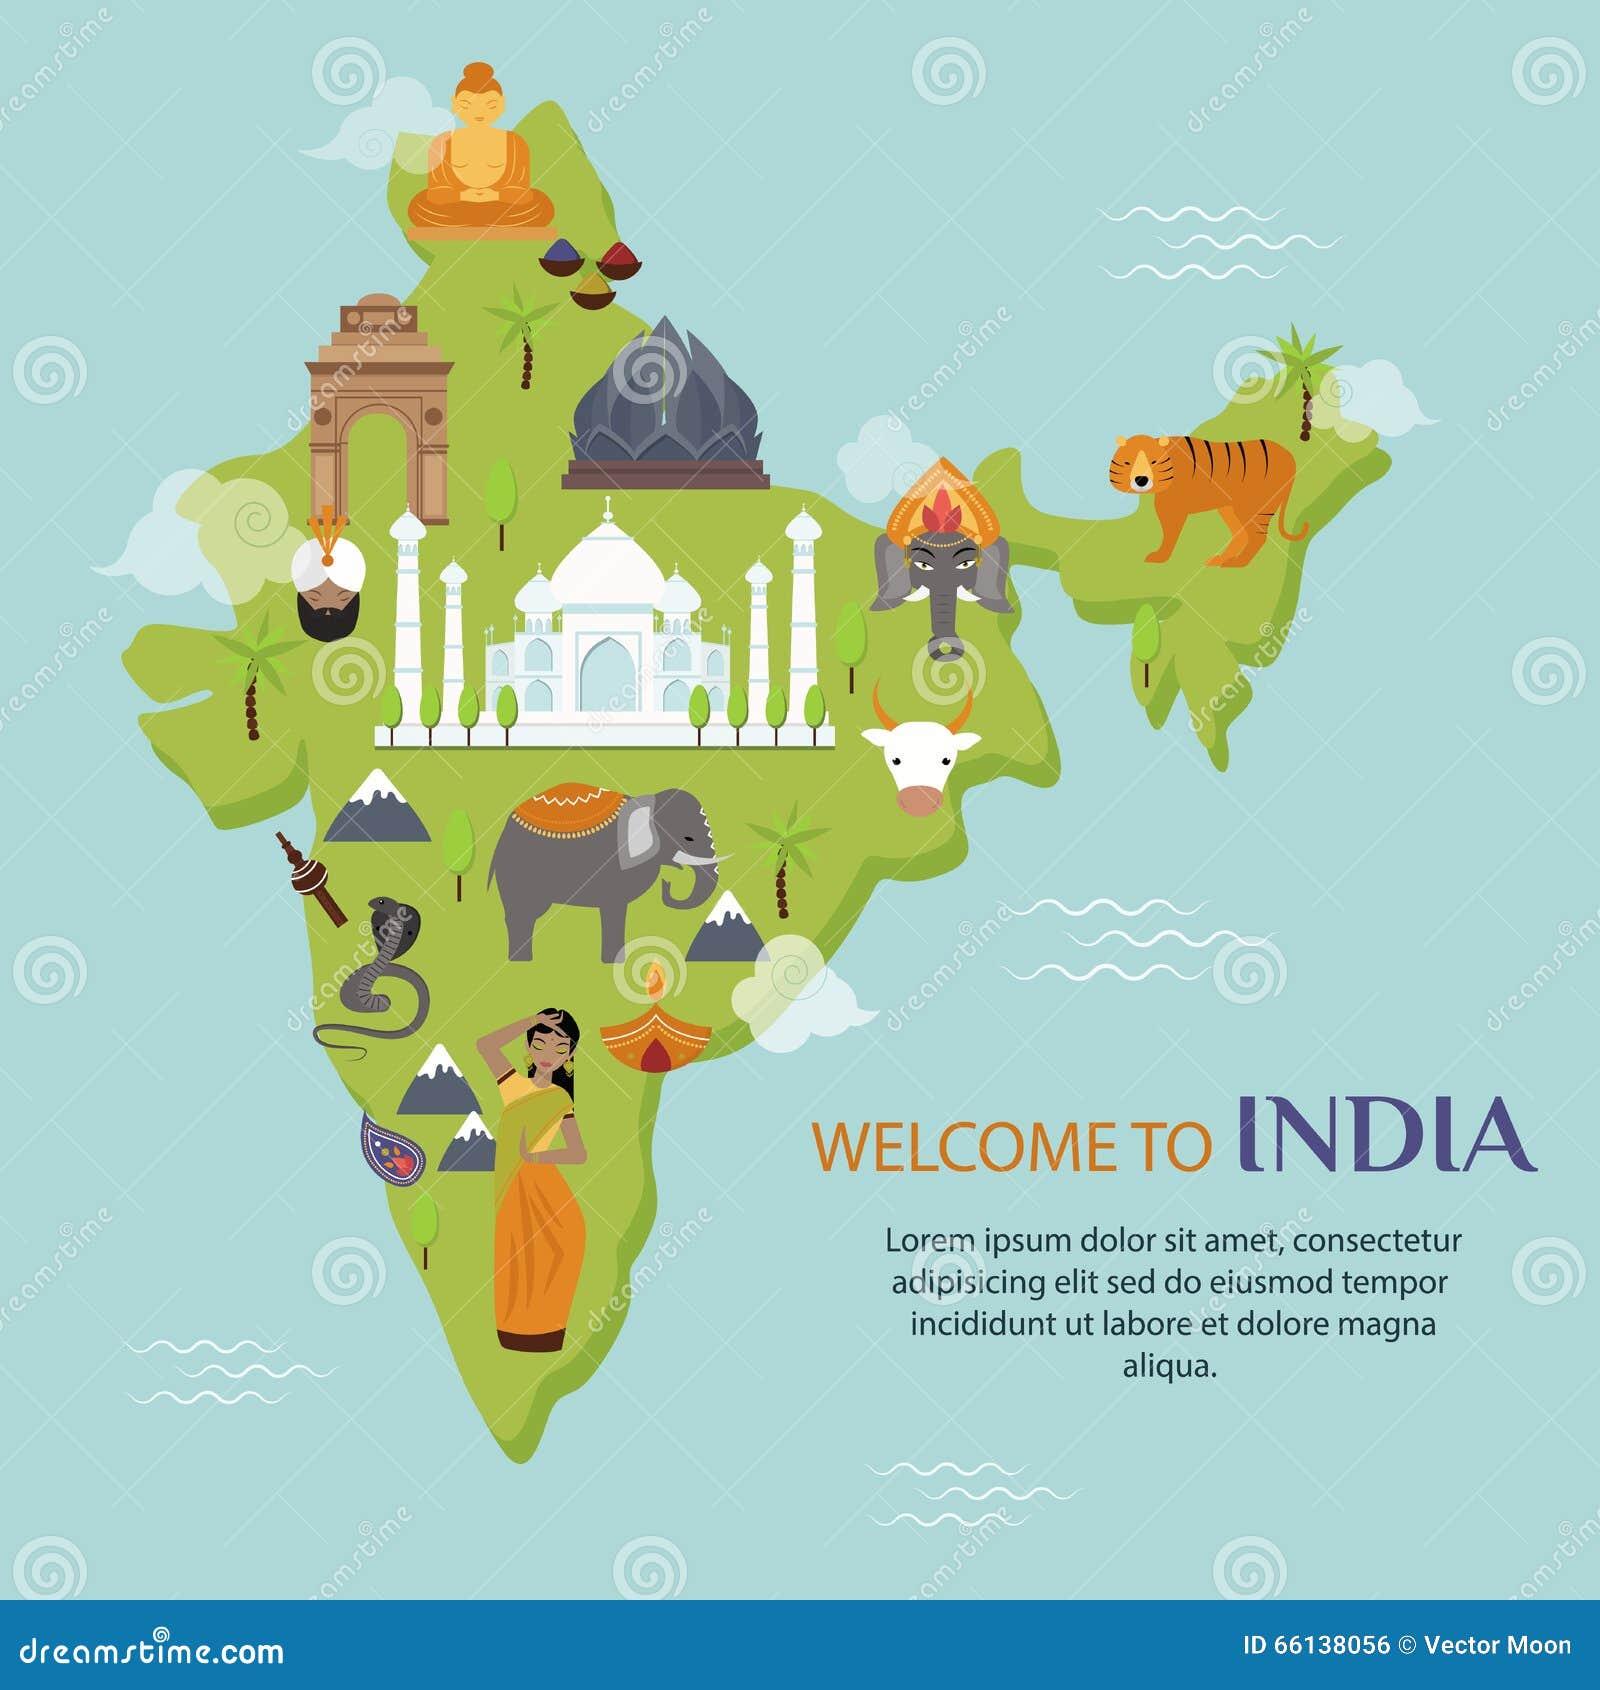 India Landmark Travel Map Vector Illustration Stock Vector Image - India map vector